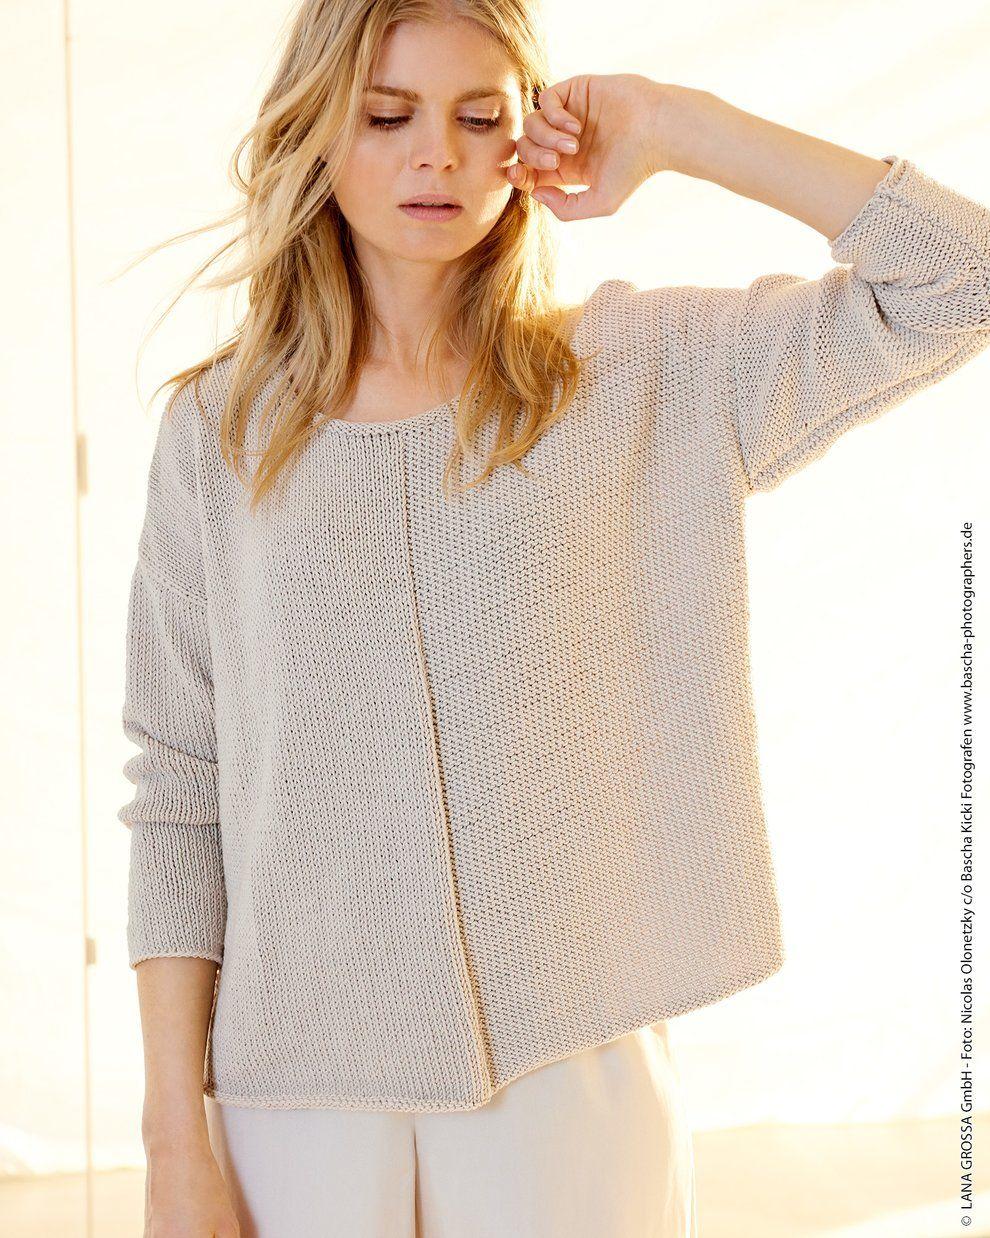 Modelle – Pullover mit glatt rechts und glatt links